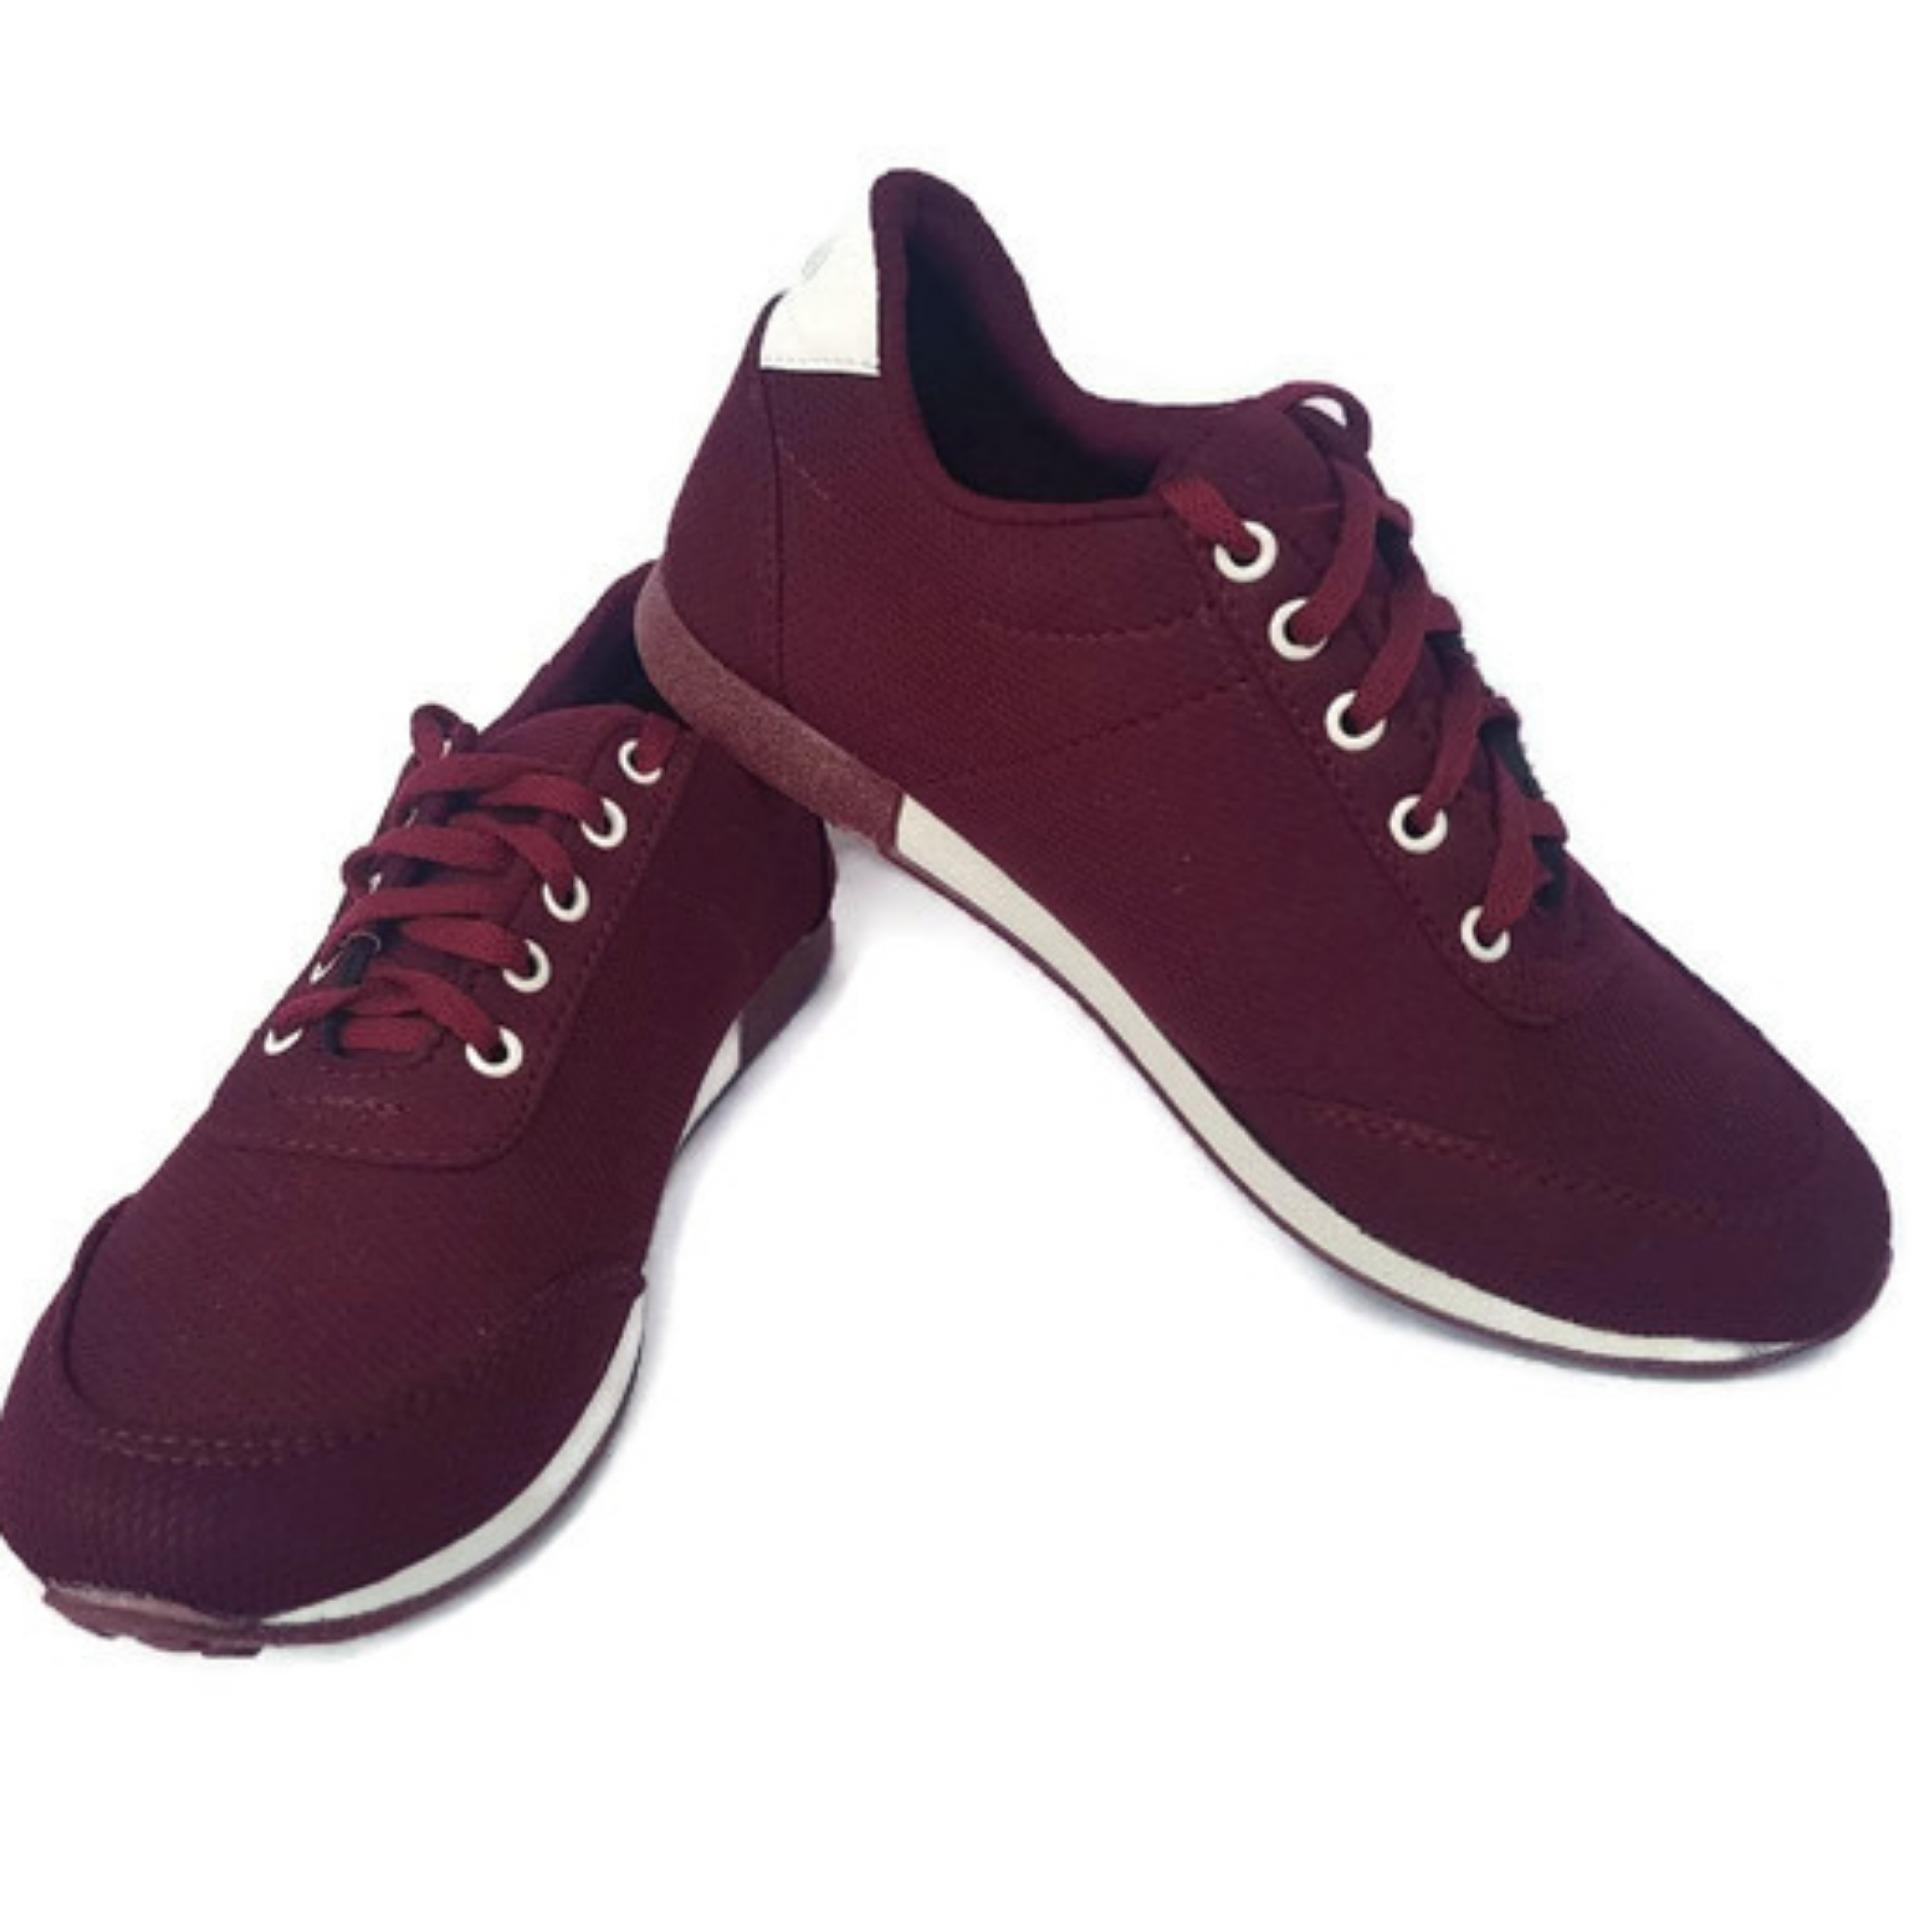 Sepatu Kets Jalan/Jogging Wanita ID 21